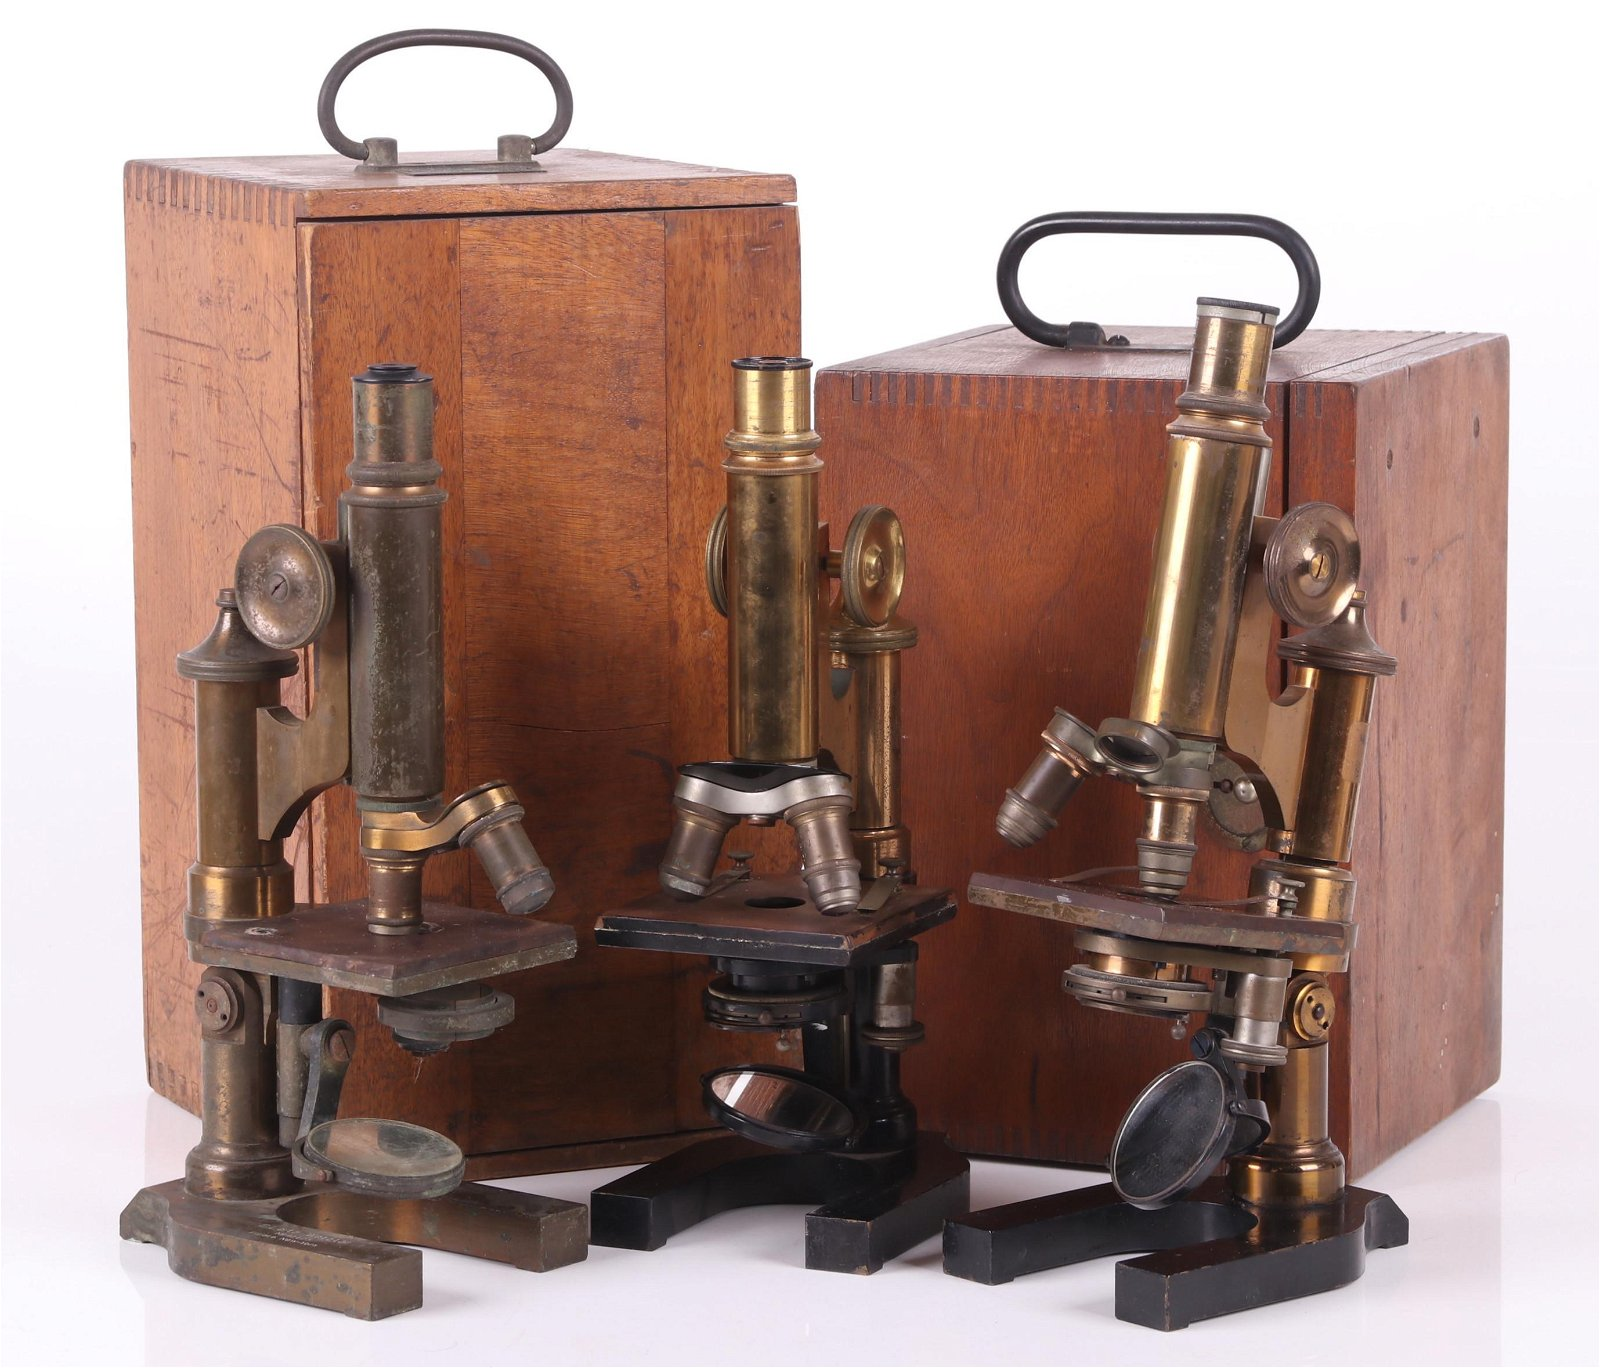 Three Leitz Wetzlar Microscopes, Circa 1900